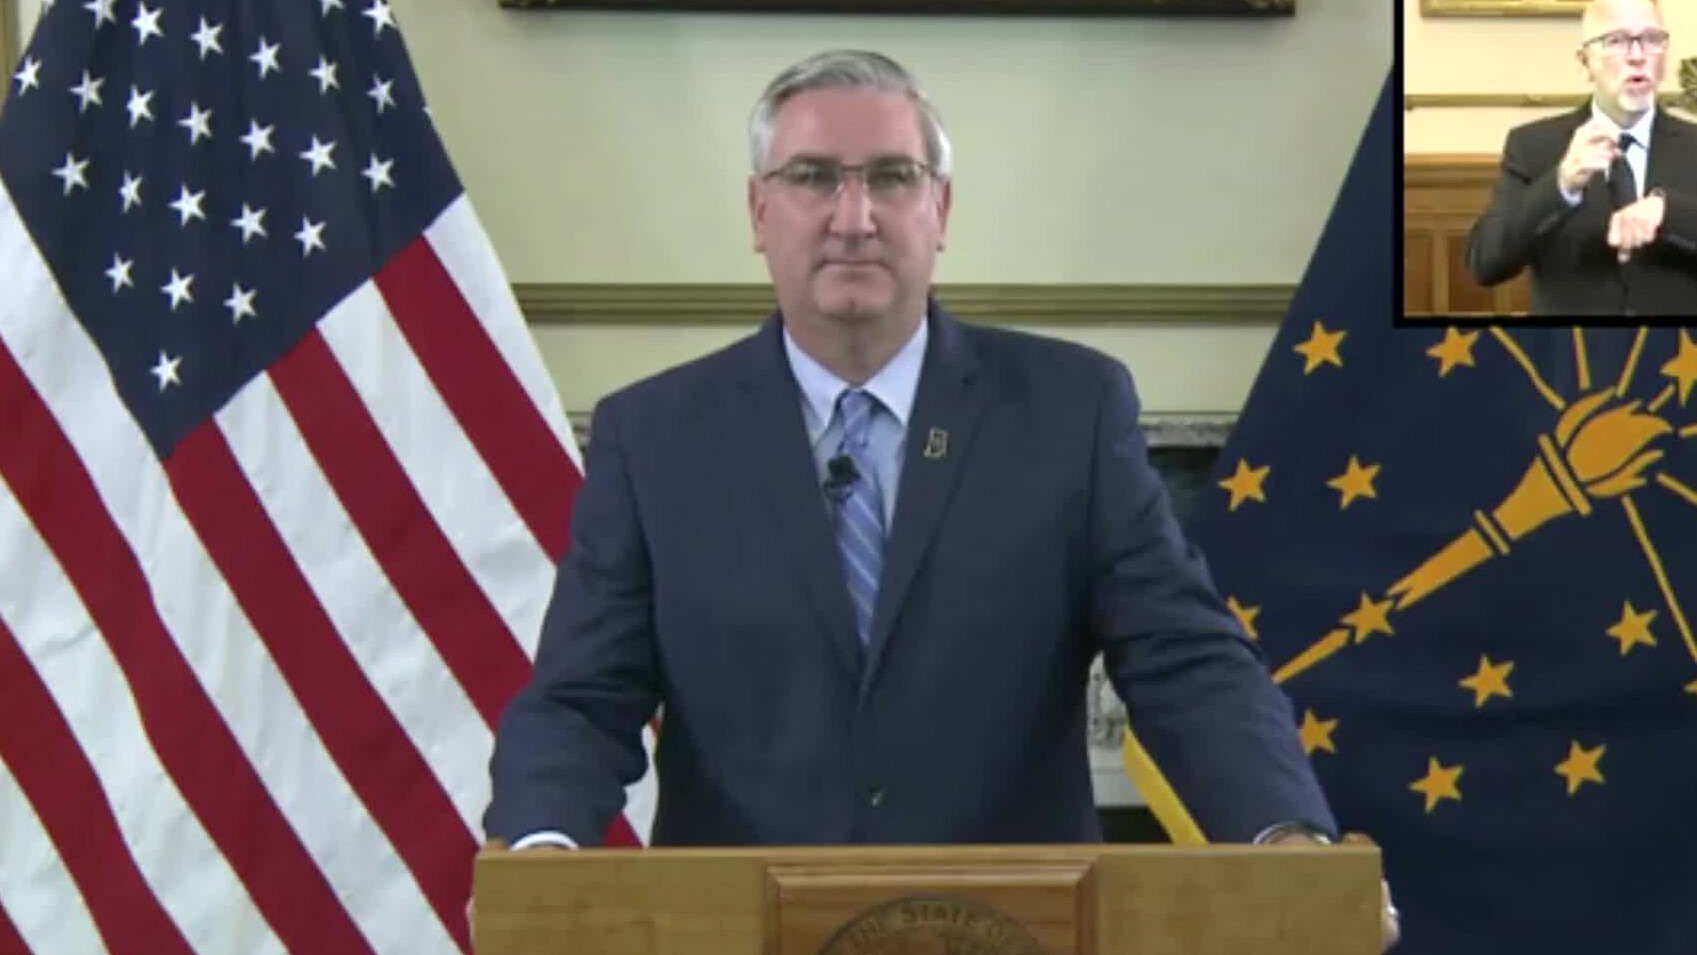 Indiana restarts pandemic unemployment benefits after judge's order